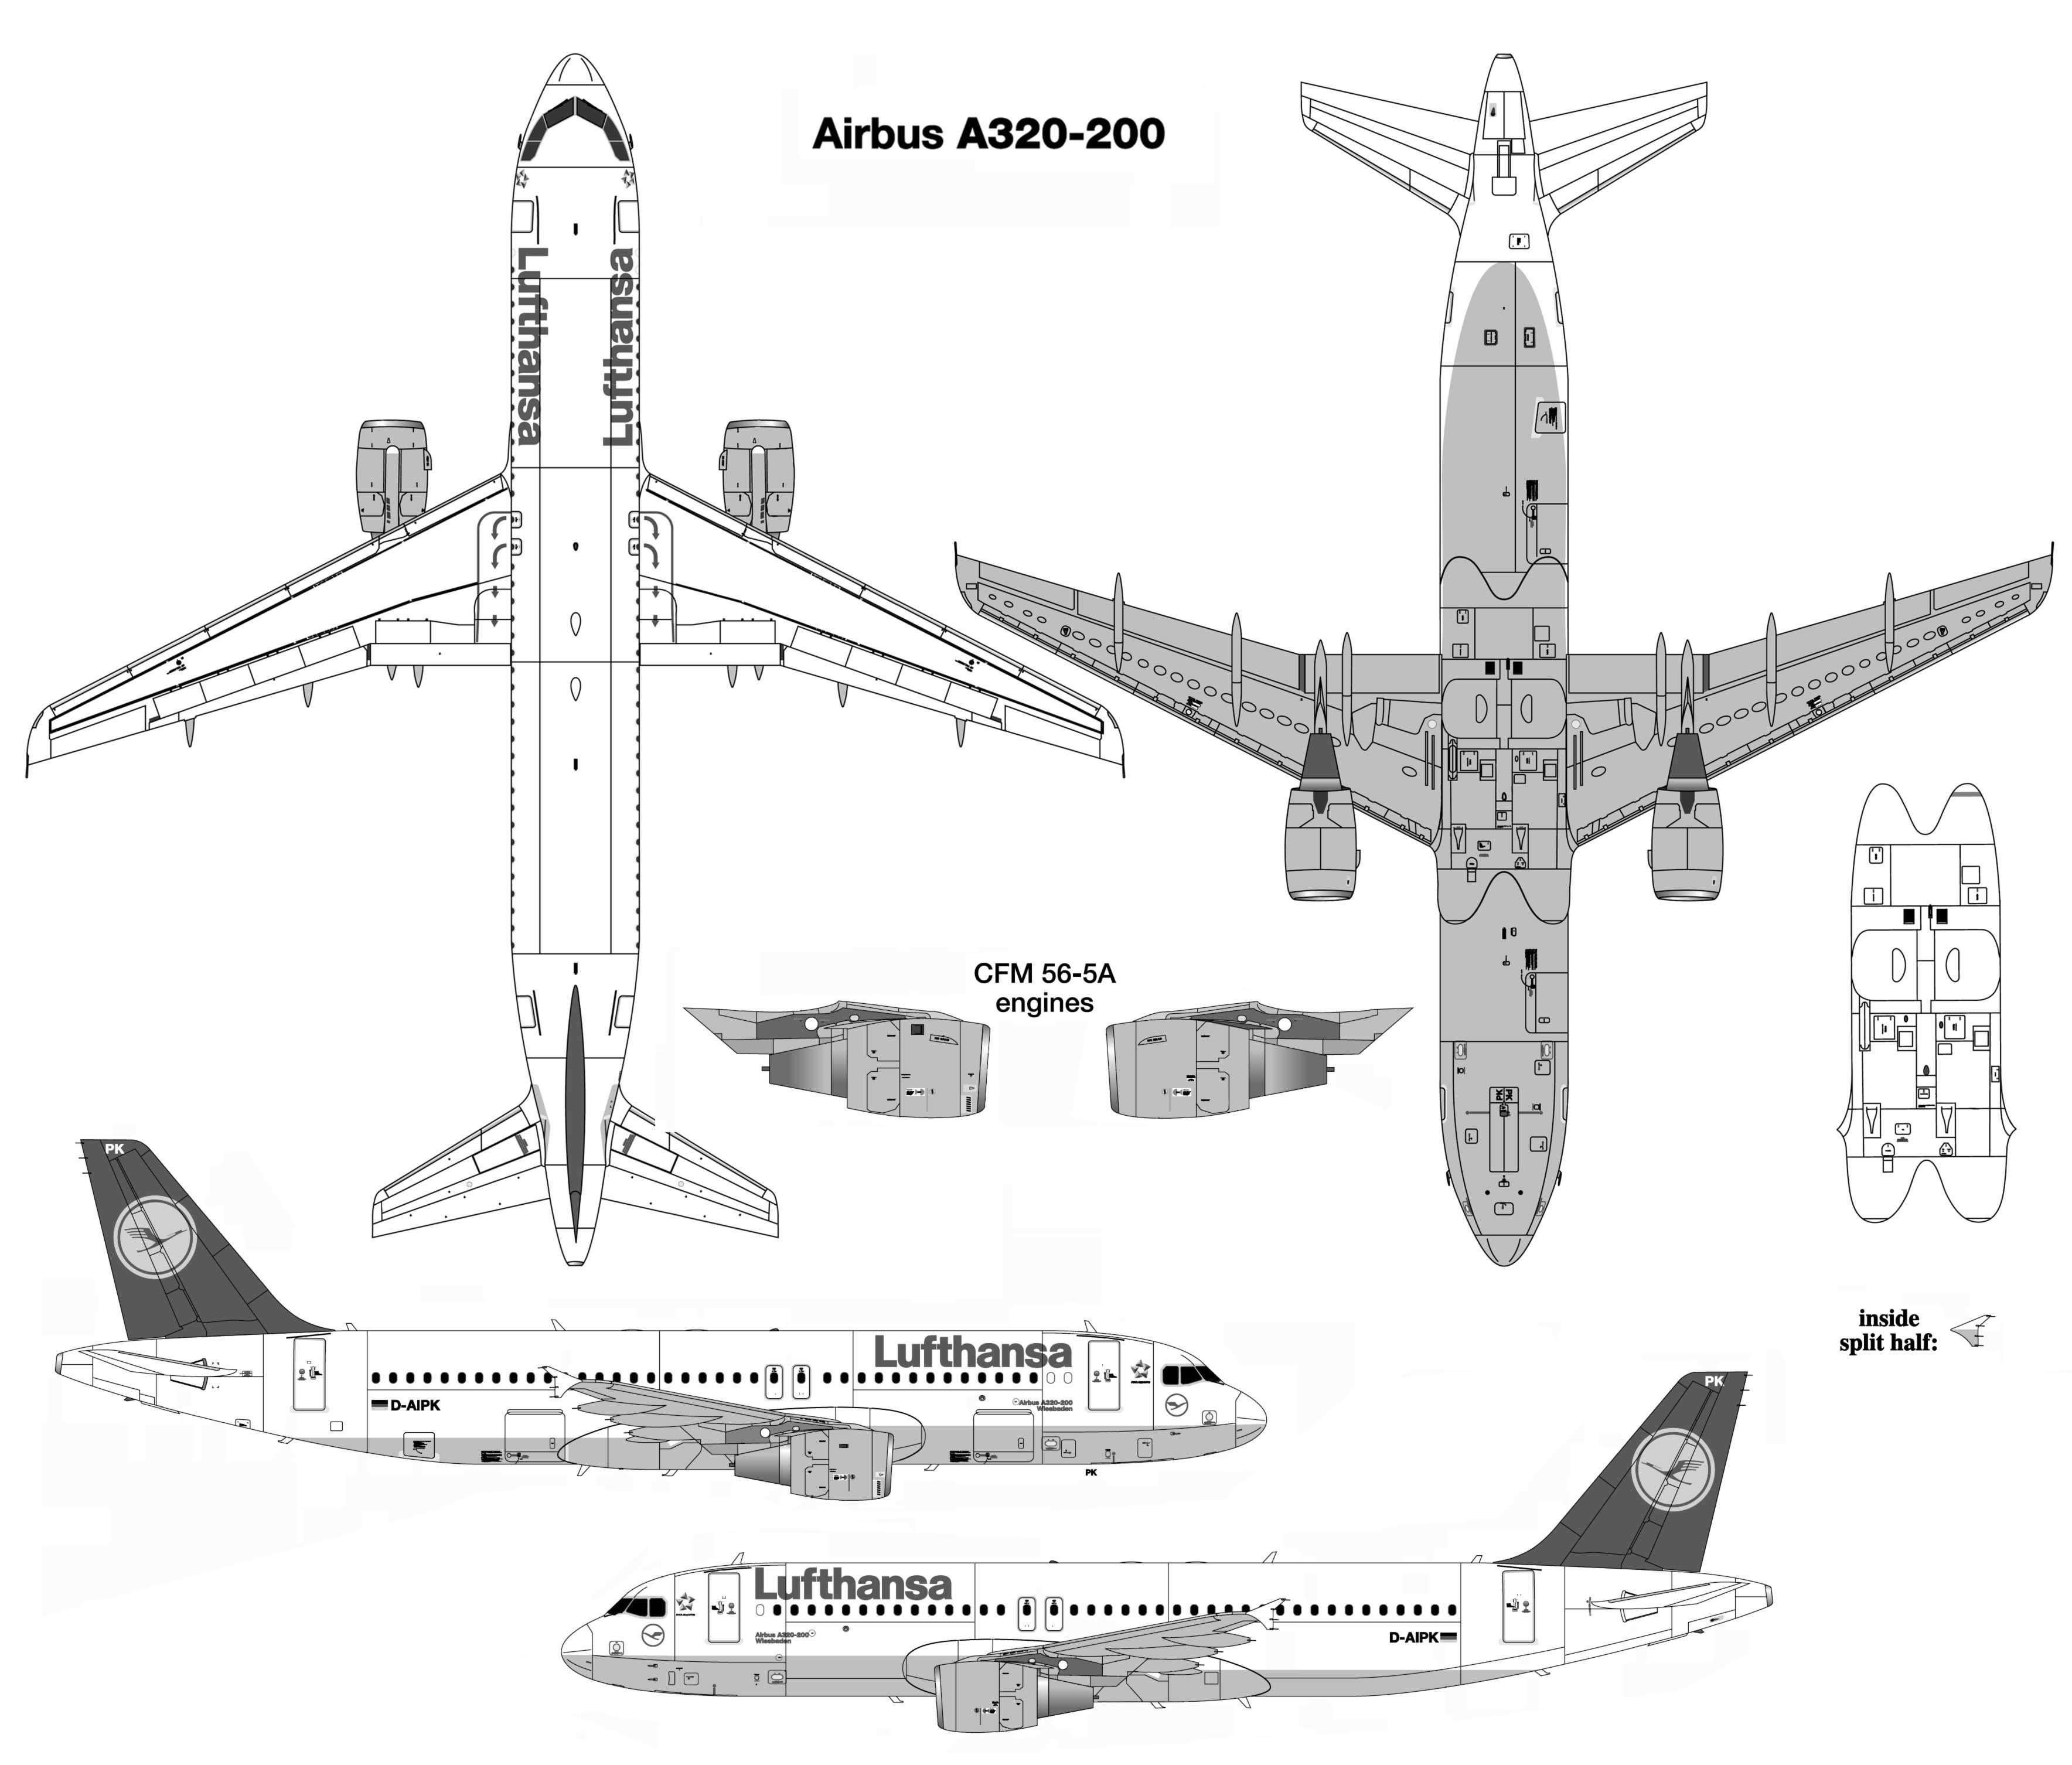 us army technical manual aviation unit maintenance avum and aviation intermediate maintenance avim manual for general aircraft maintenance tools volume 9 tm 1 1500 204 23 9 1992